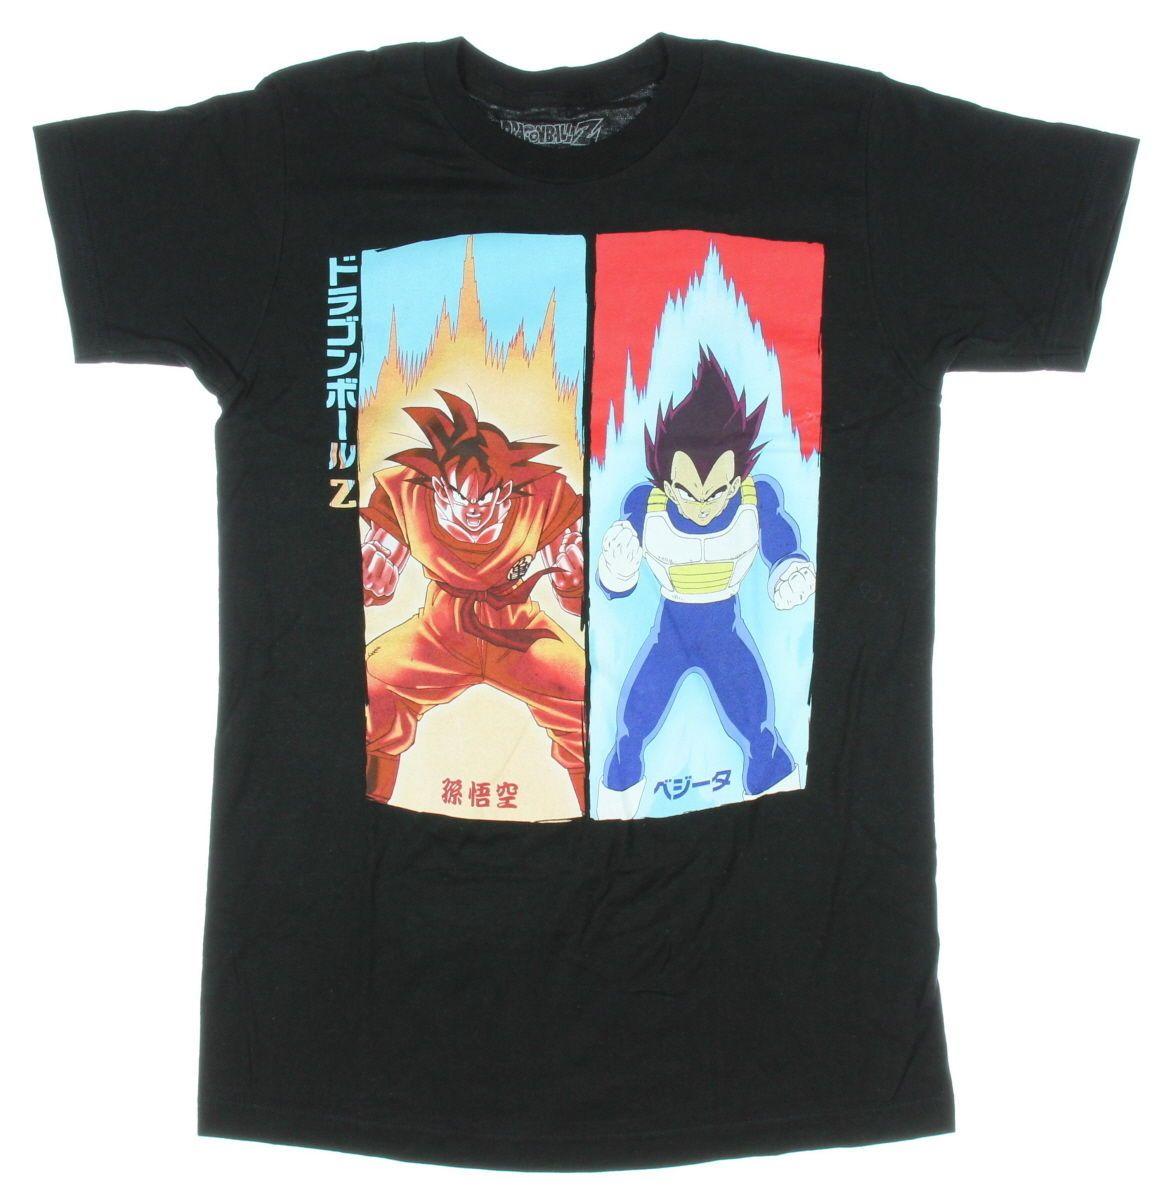 76423dfe Dragon Ball Z Goku vs Vegeta T Shirt   eBay   T-Shirts   Vegeta t ...